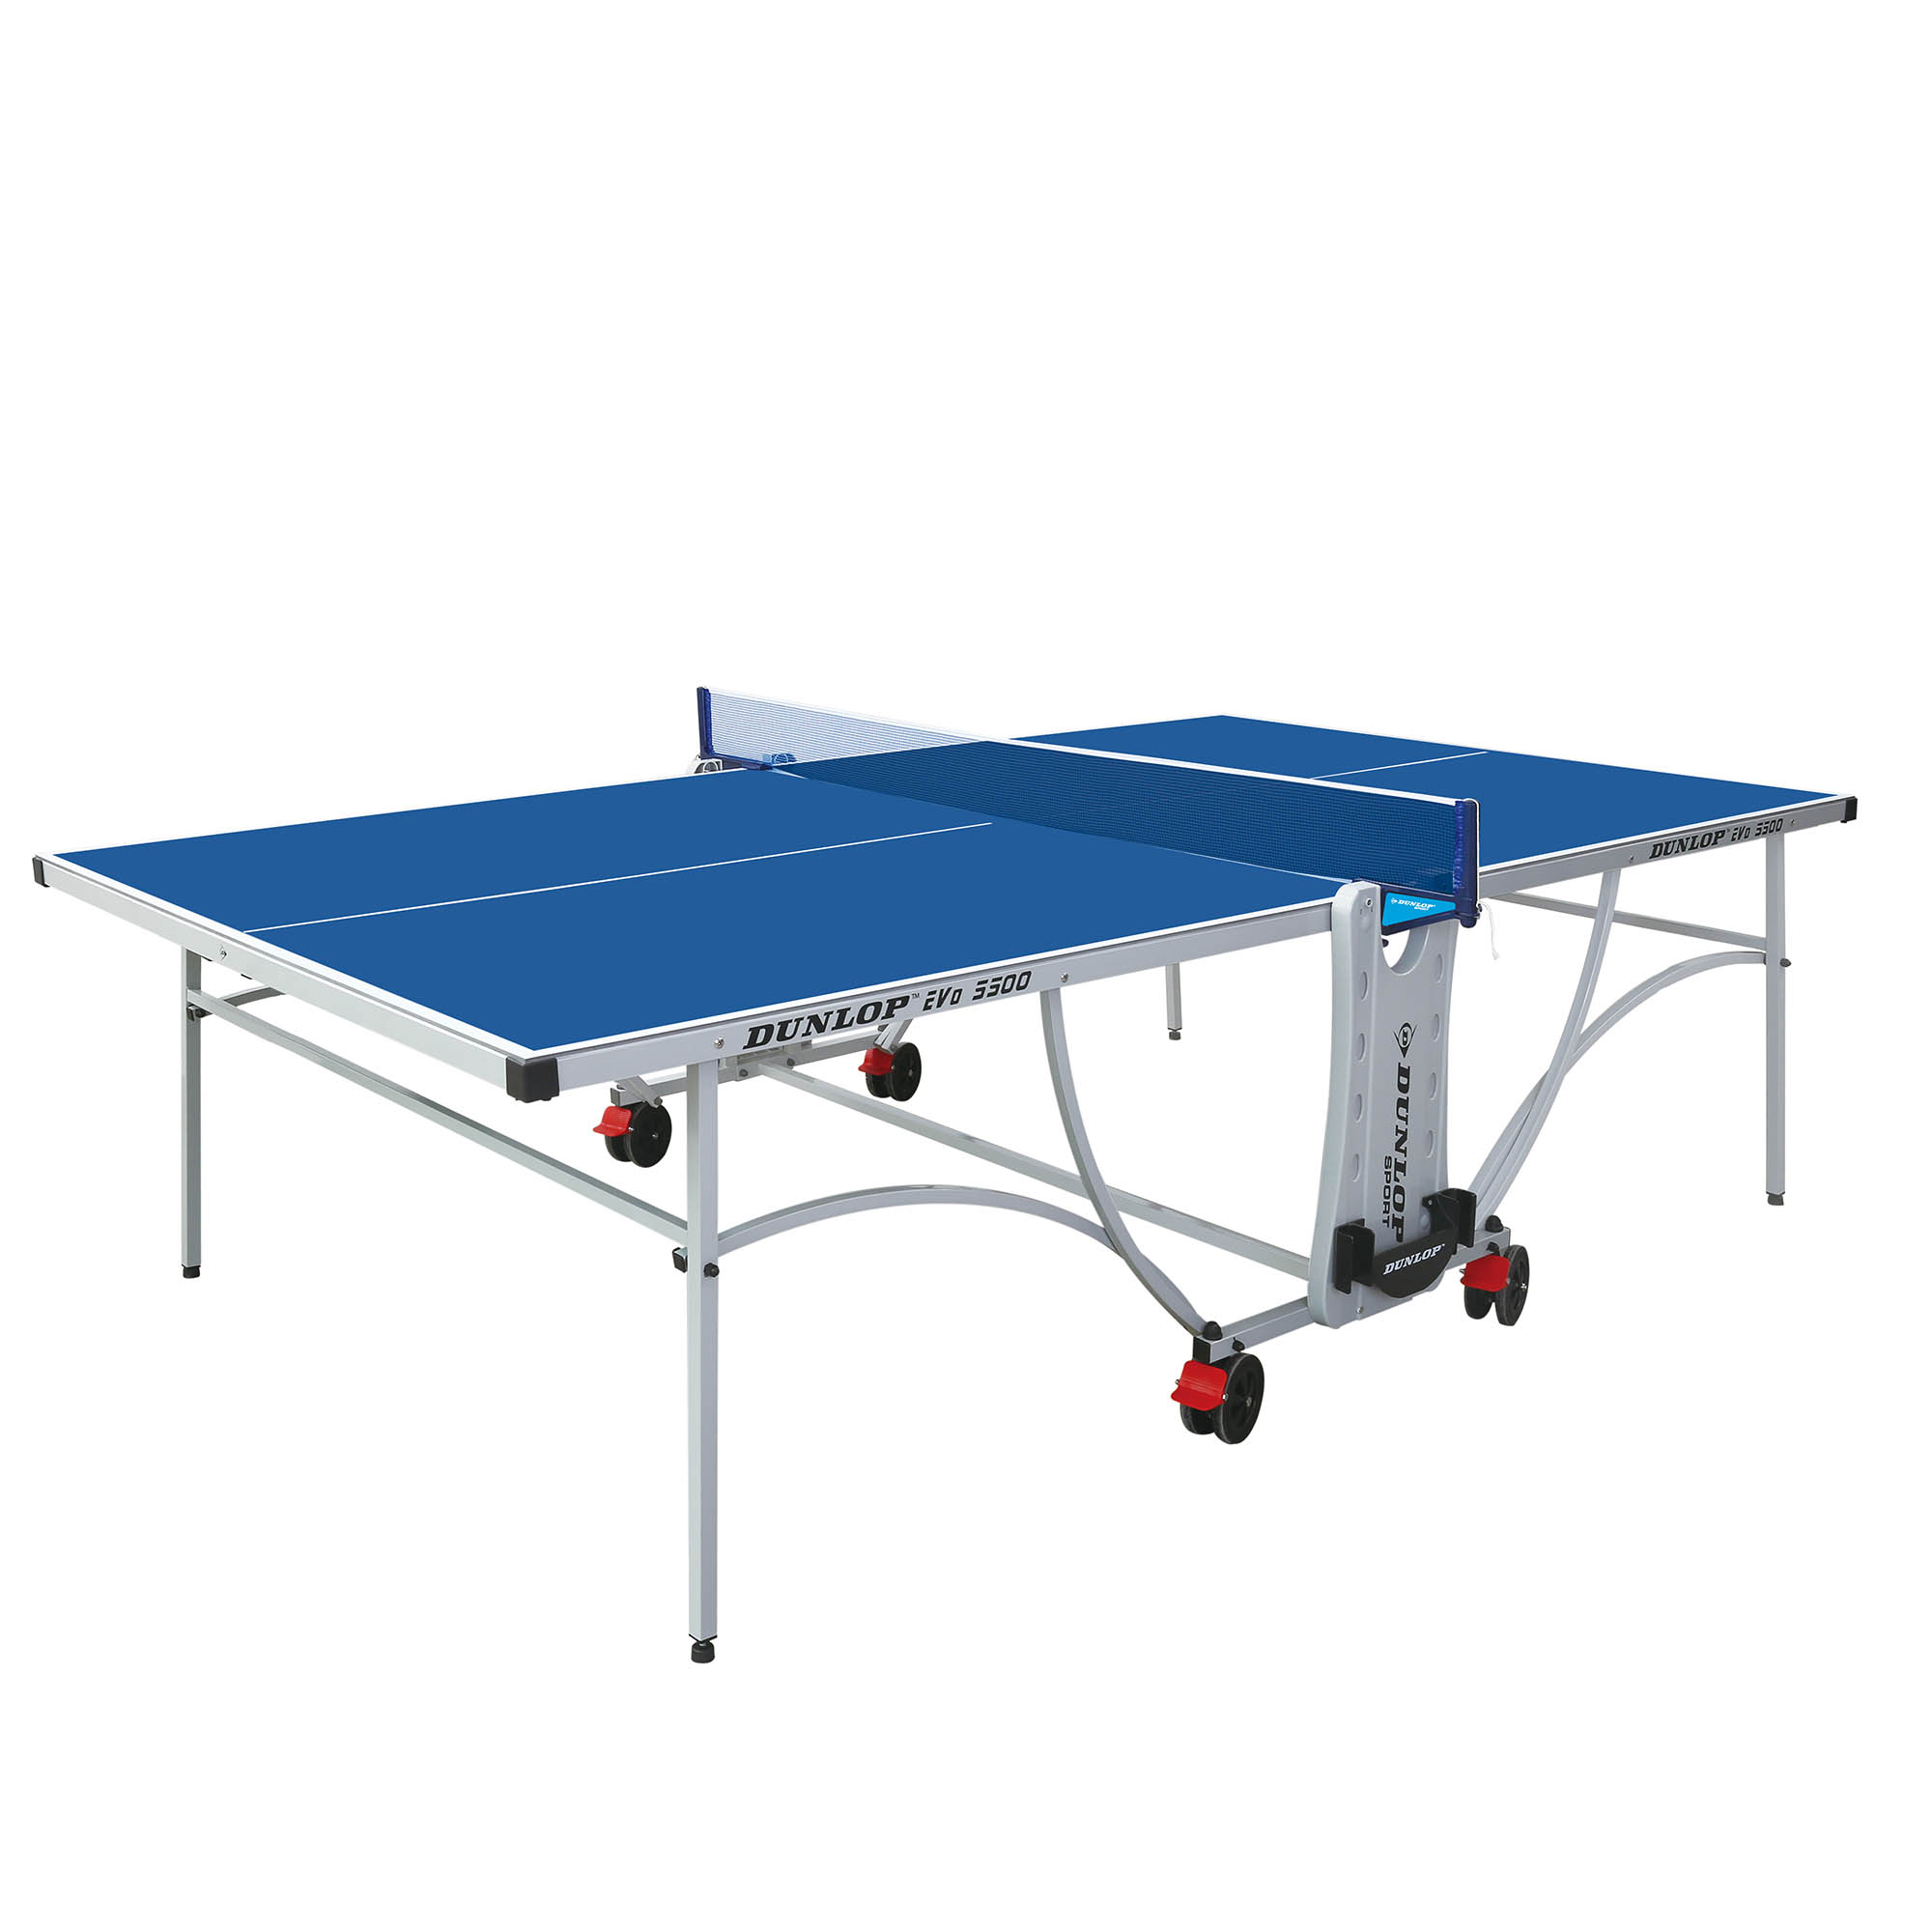 Dunlop Evo 5500 Outdoor Table Tennis Table  Blue